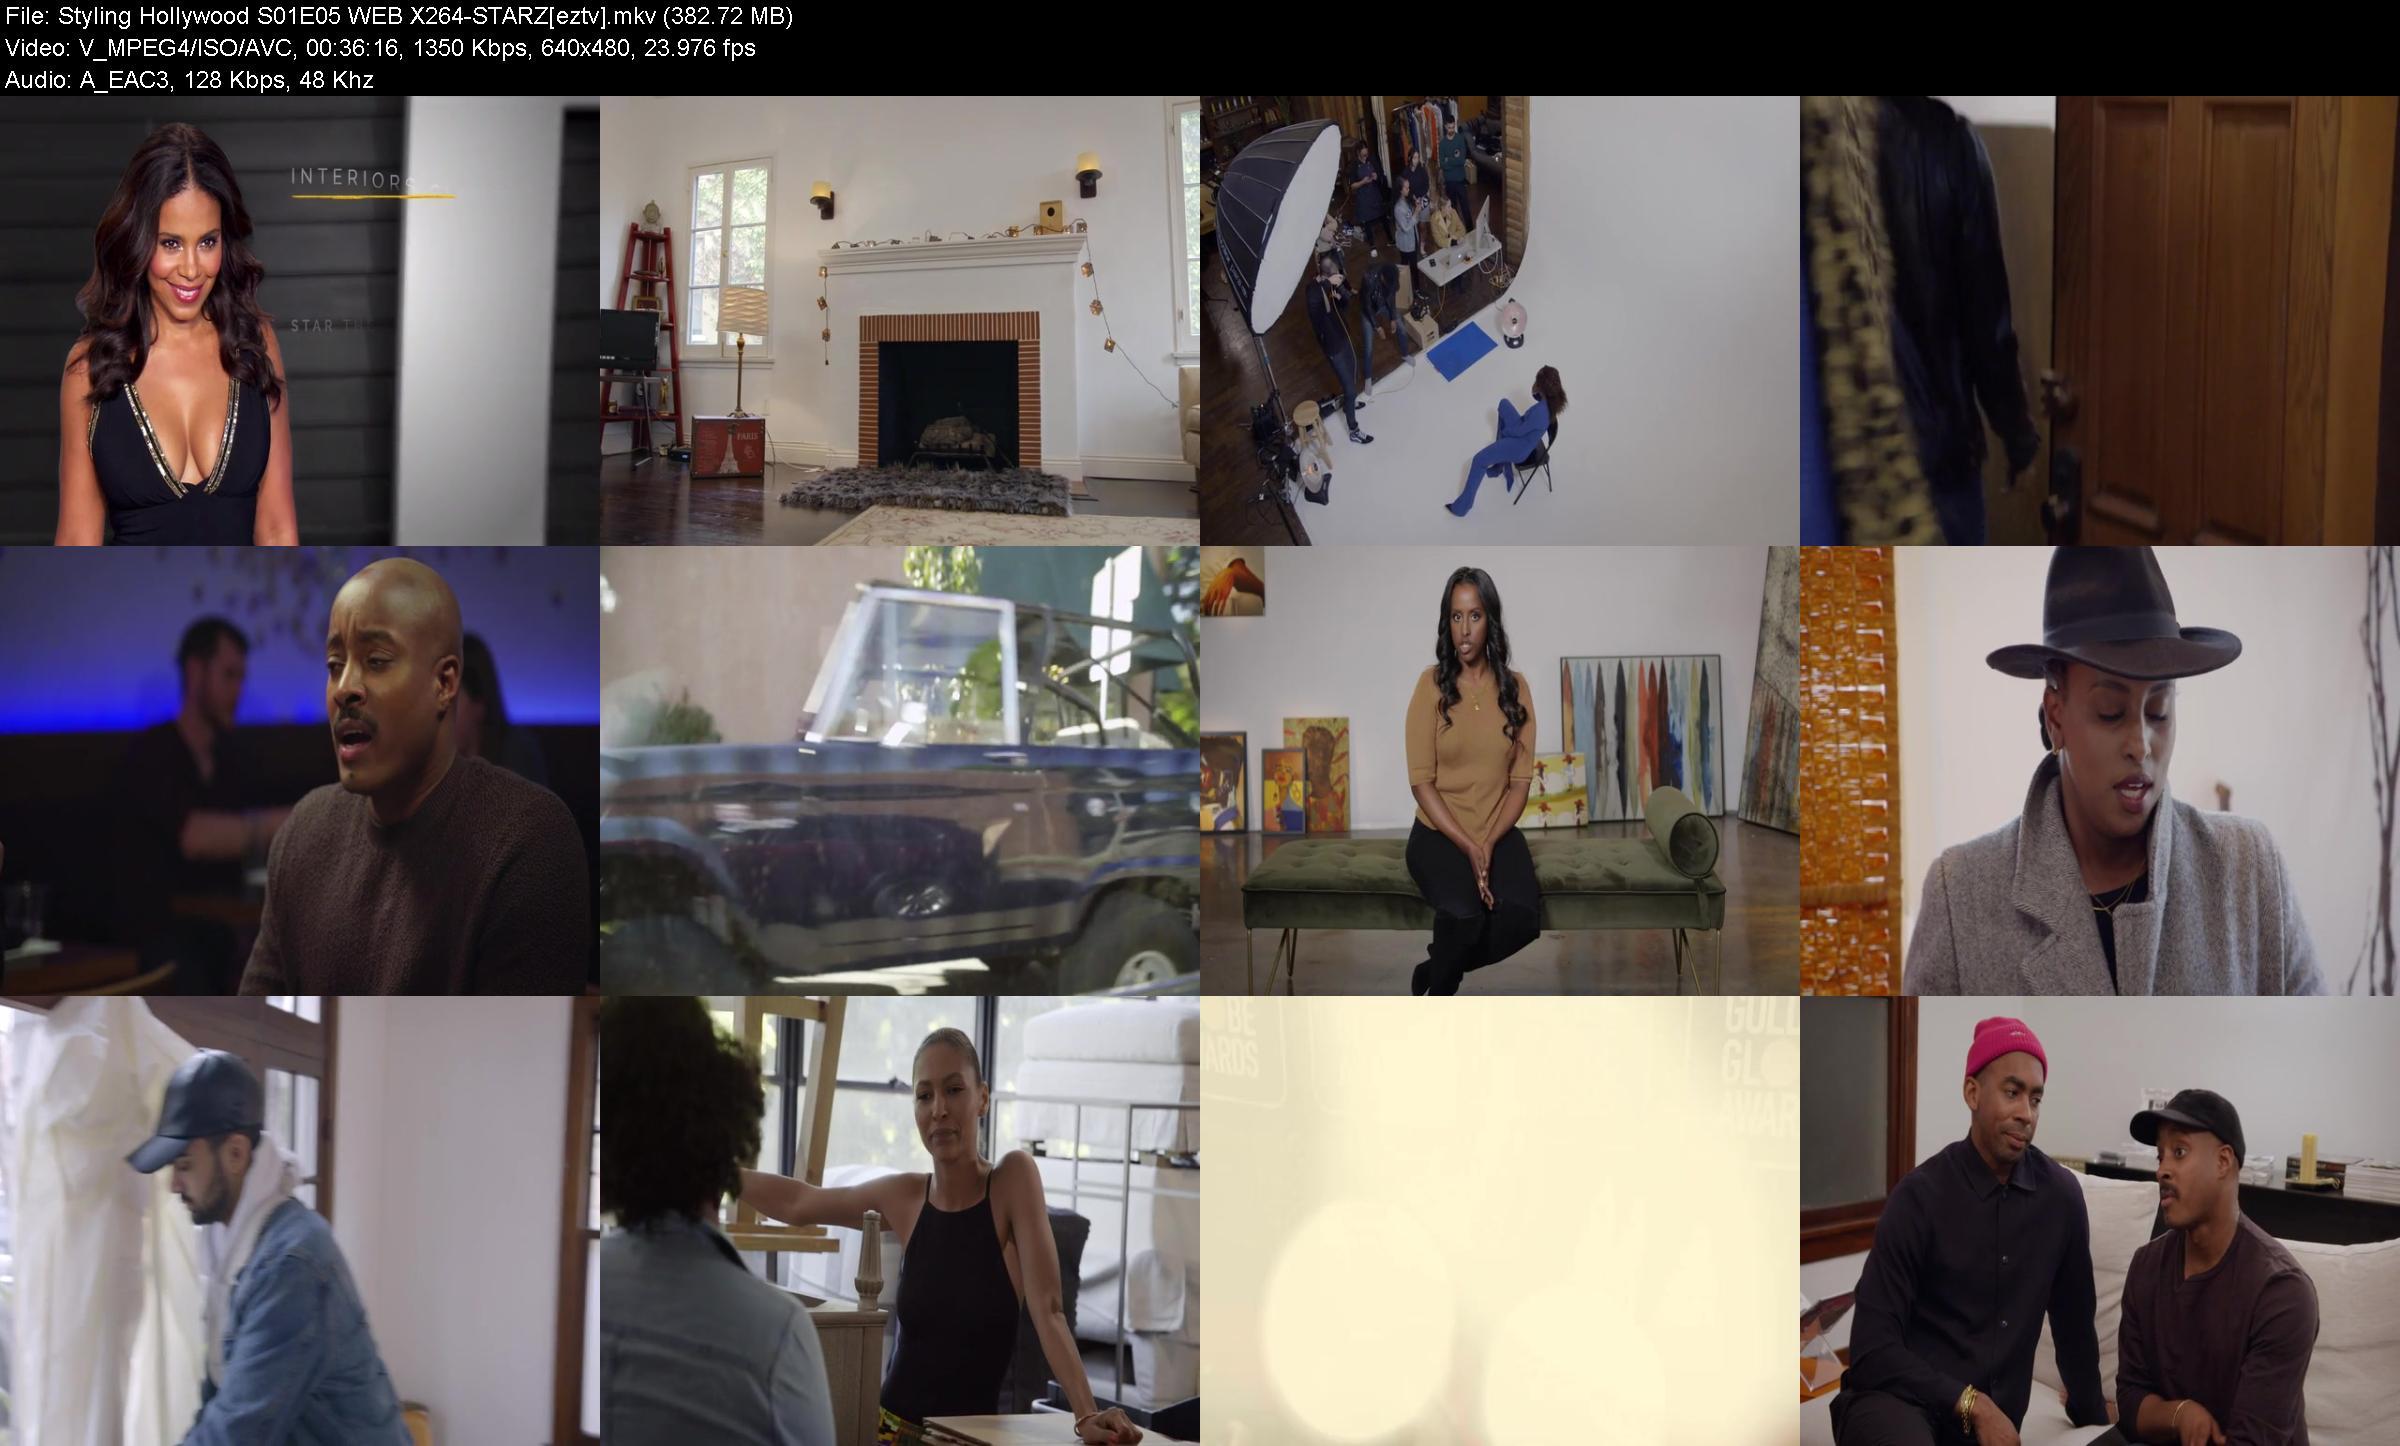 Styling Hollywood S01E05 WEB X264-STARZ